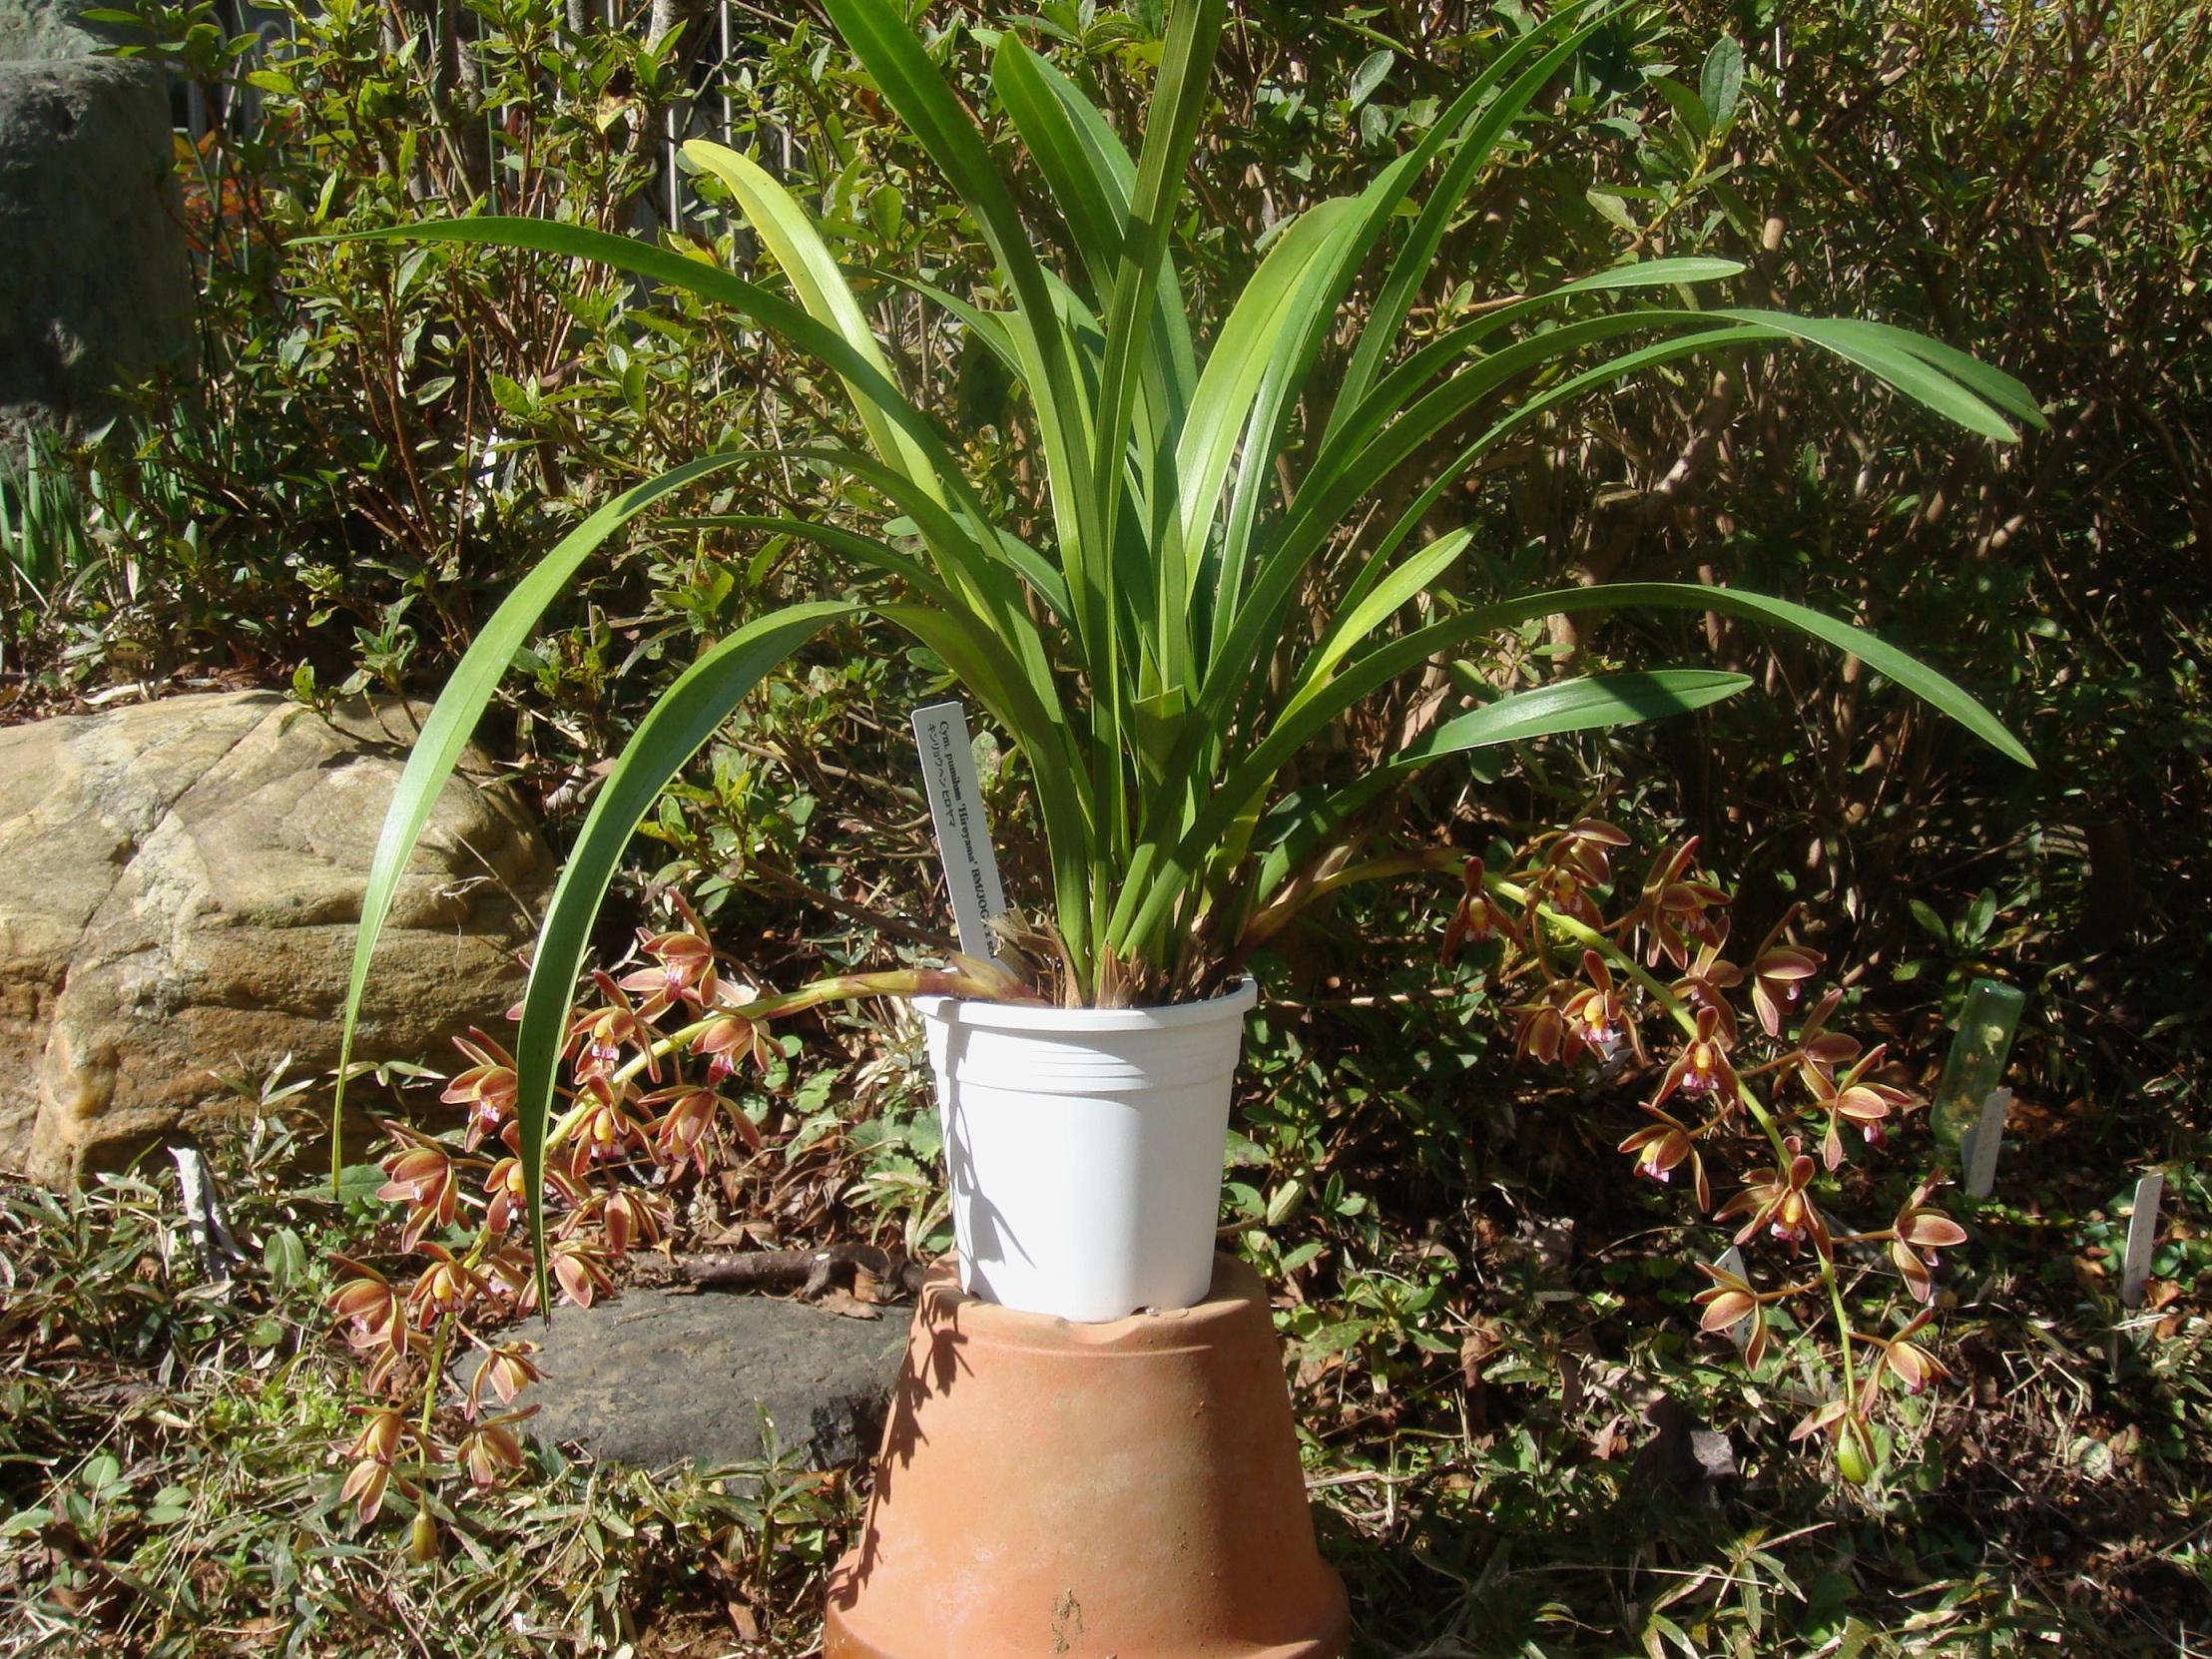 http://orchids.la.coocan.jp/Cymbidium/Cymbidium%20floribundum/DSC02824.JPG